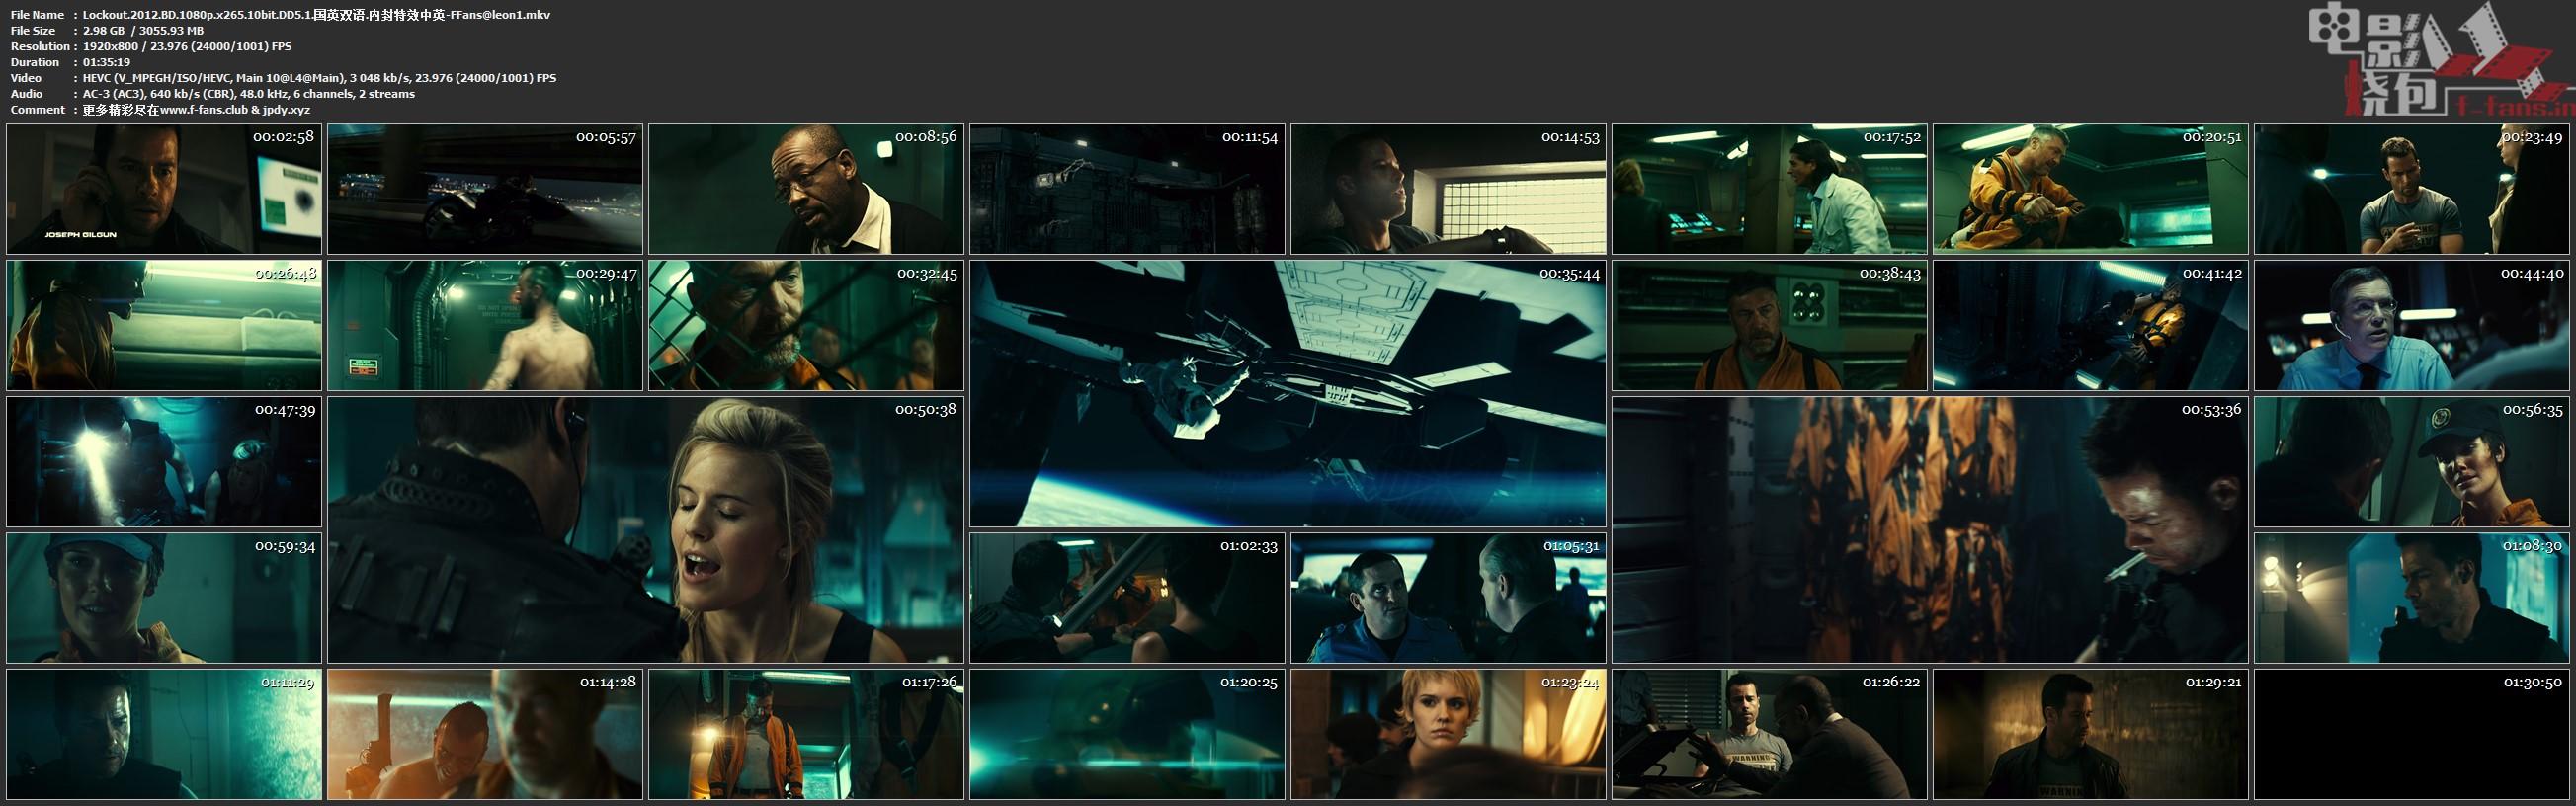 Lockout.2012.BD.1080p.x265.10bit.DD5.1..-FFansleon1.mkv.jpg